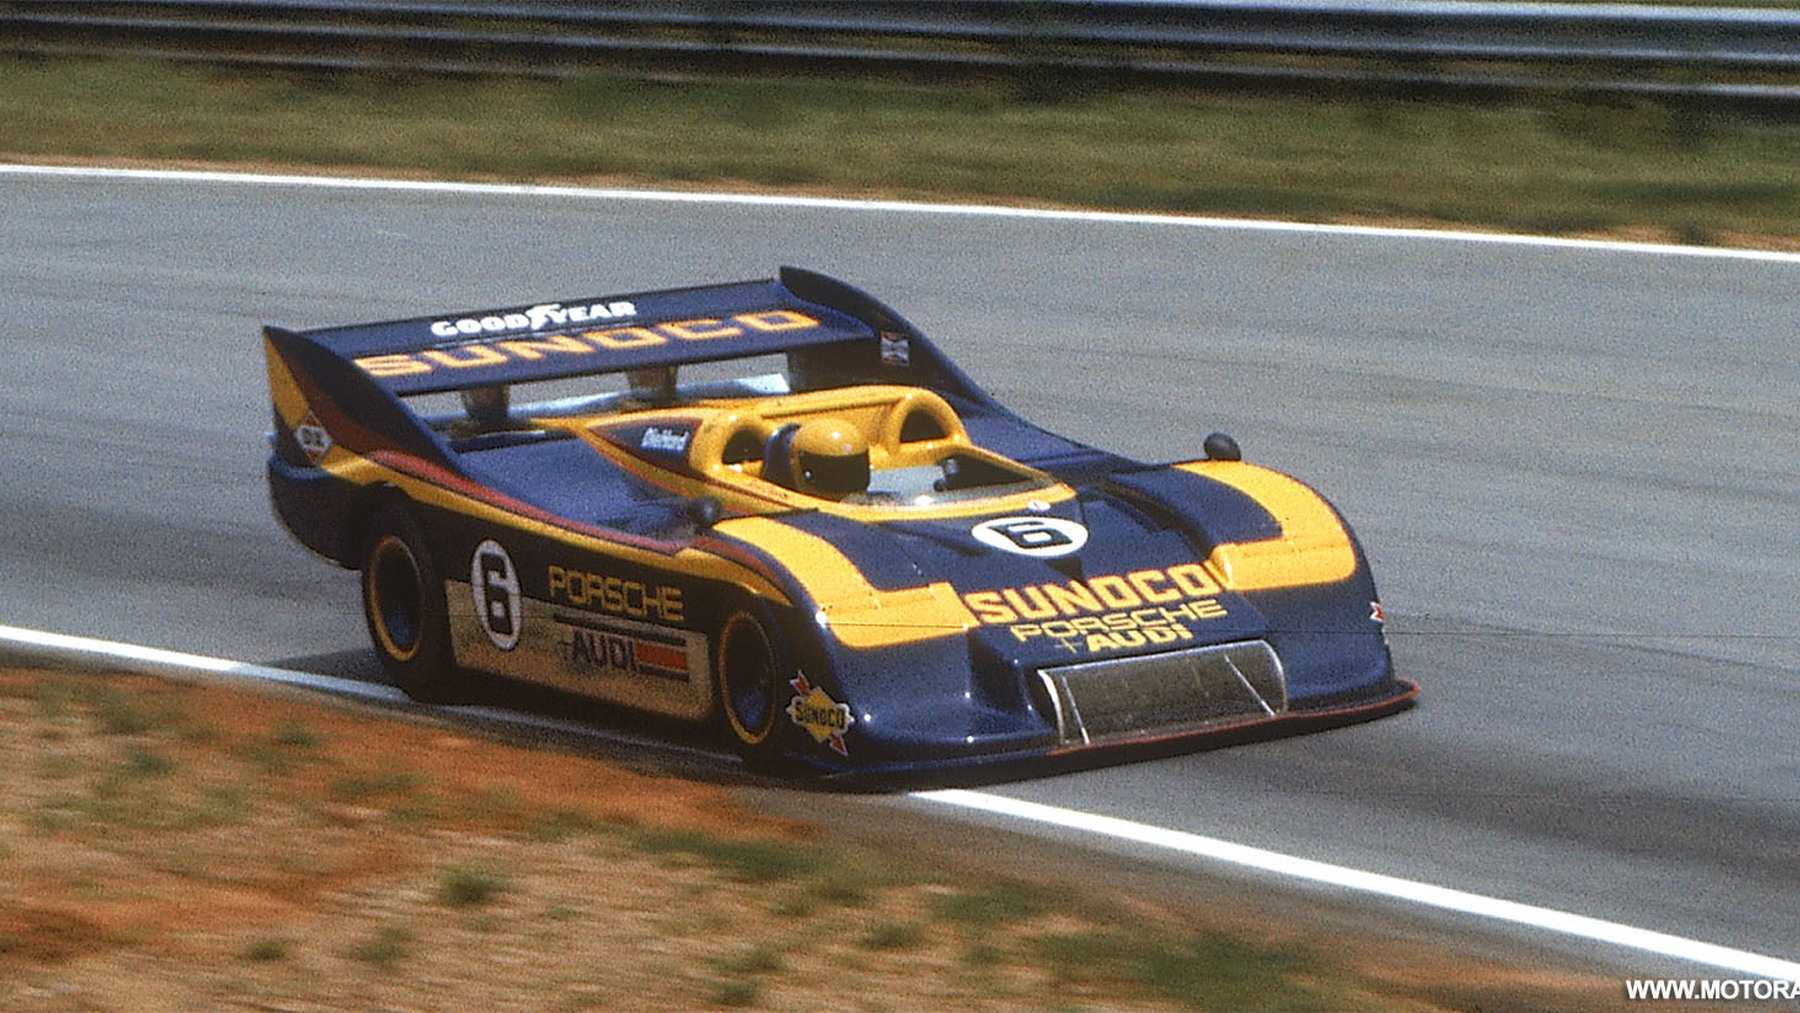 porsche 917 race car 005